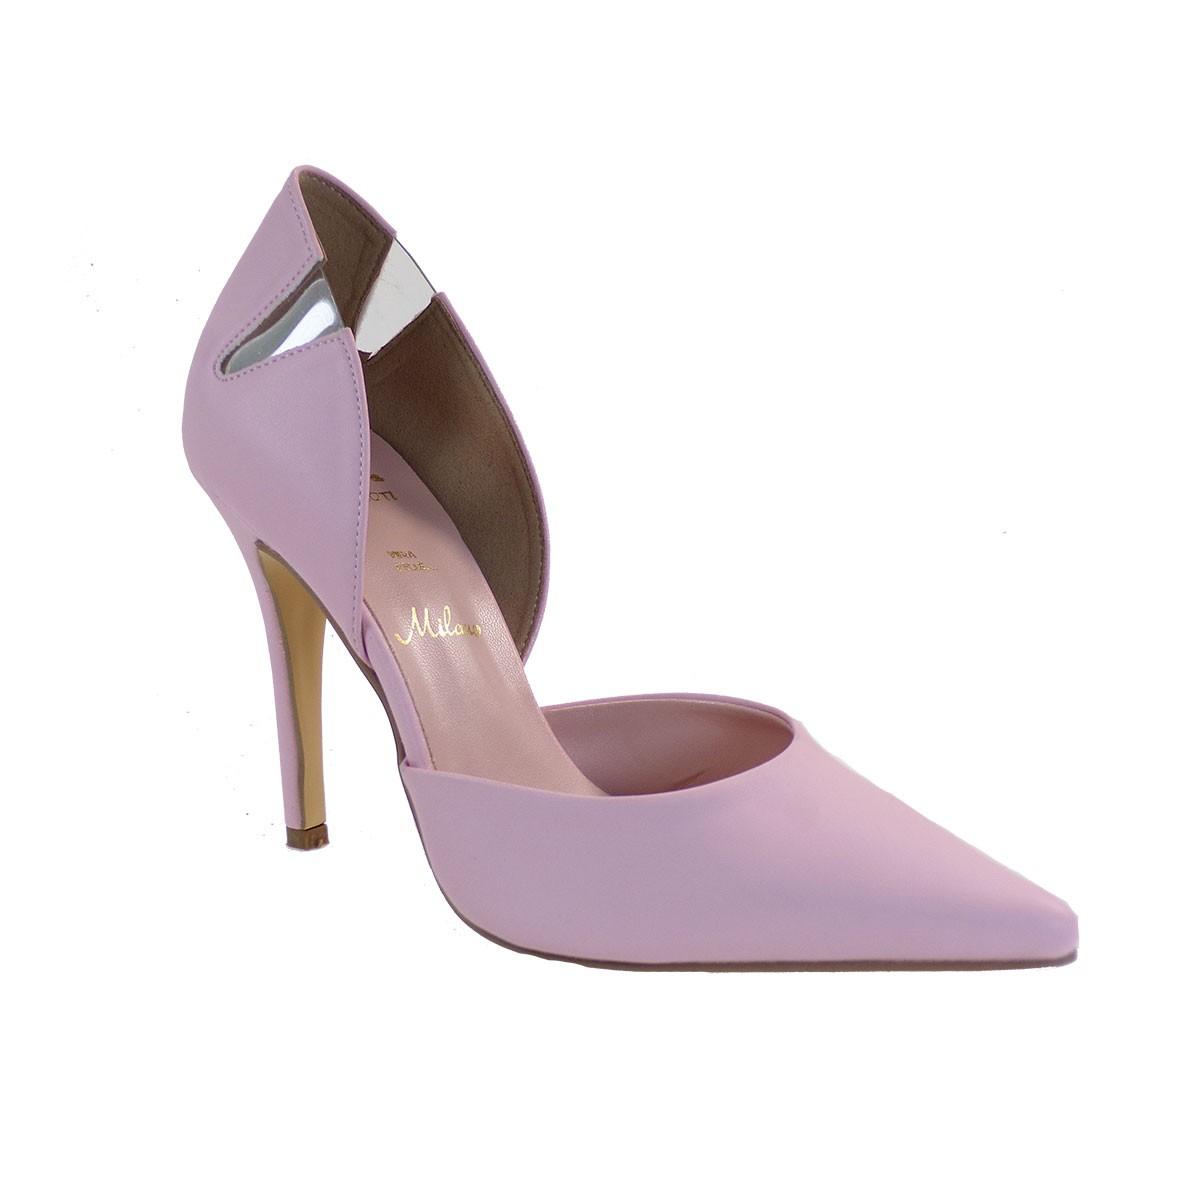 Alessandra Paggioti Γυναικεία Παπούτσια Γόβες 89800 Ροζ Mατ